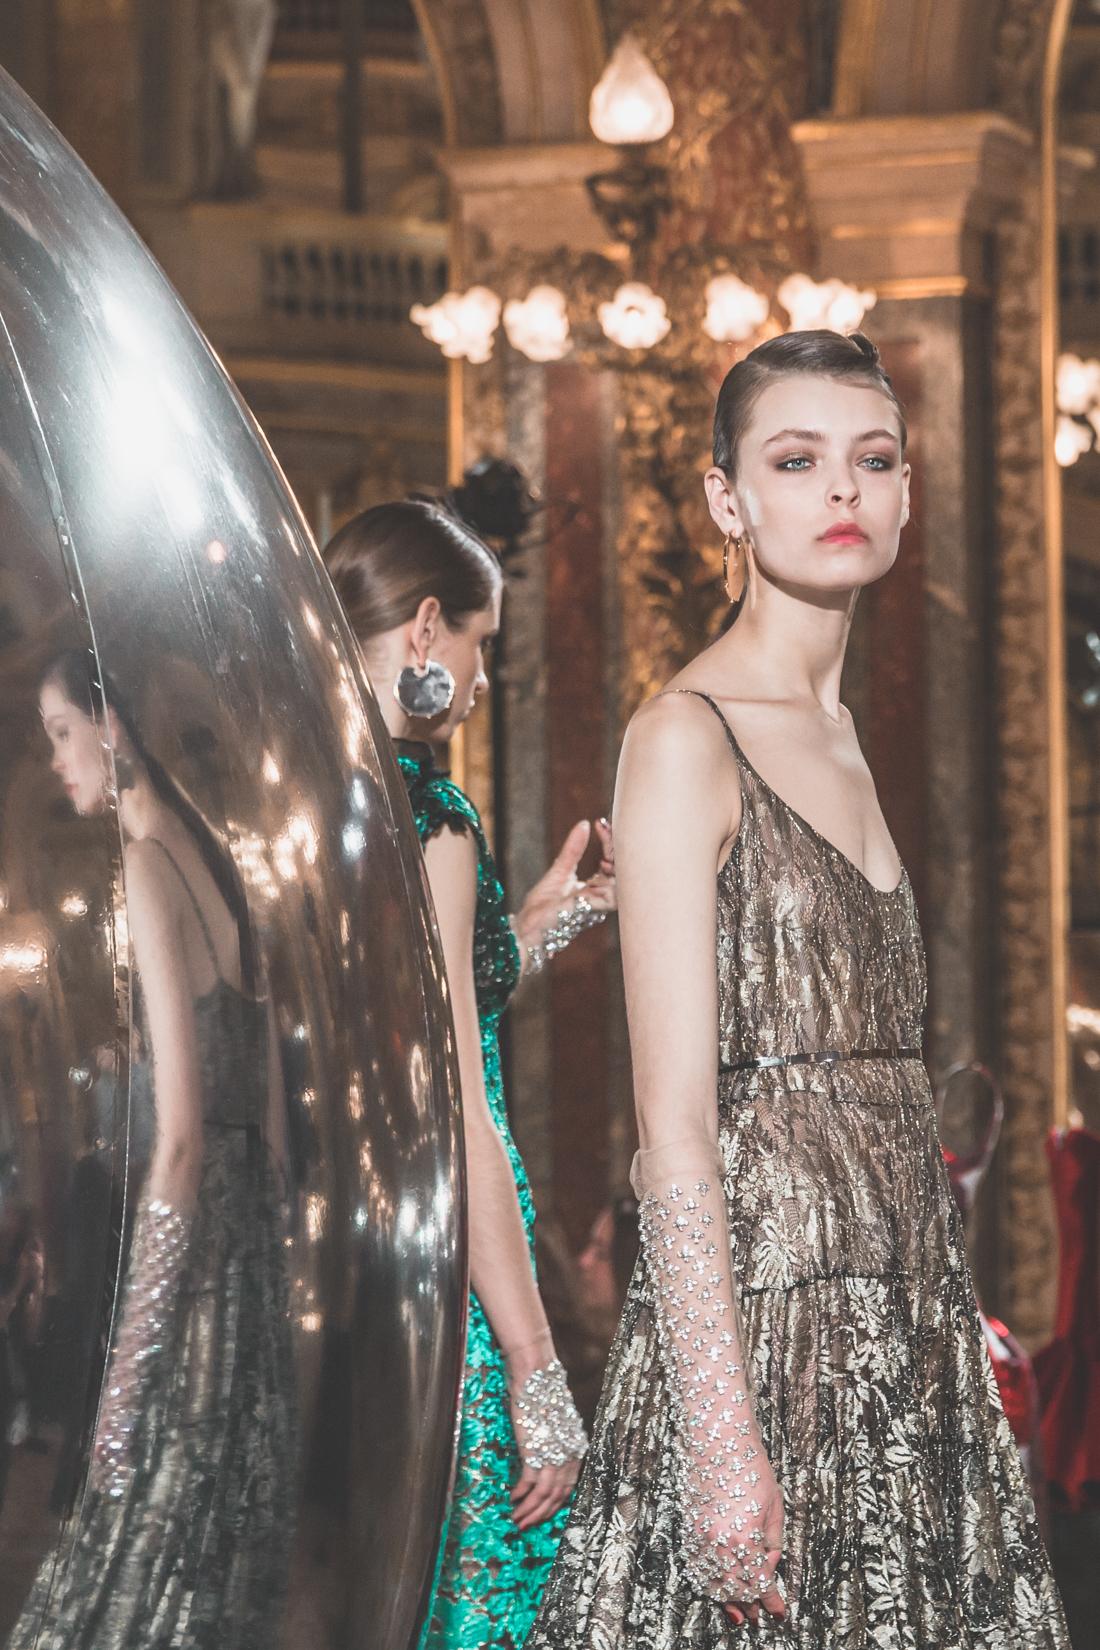 show_paule_ka_mirror_photographe_pauline_privez_copyright_paulinefashionblog_com-9